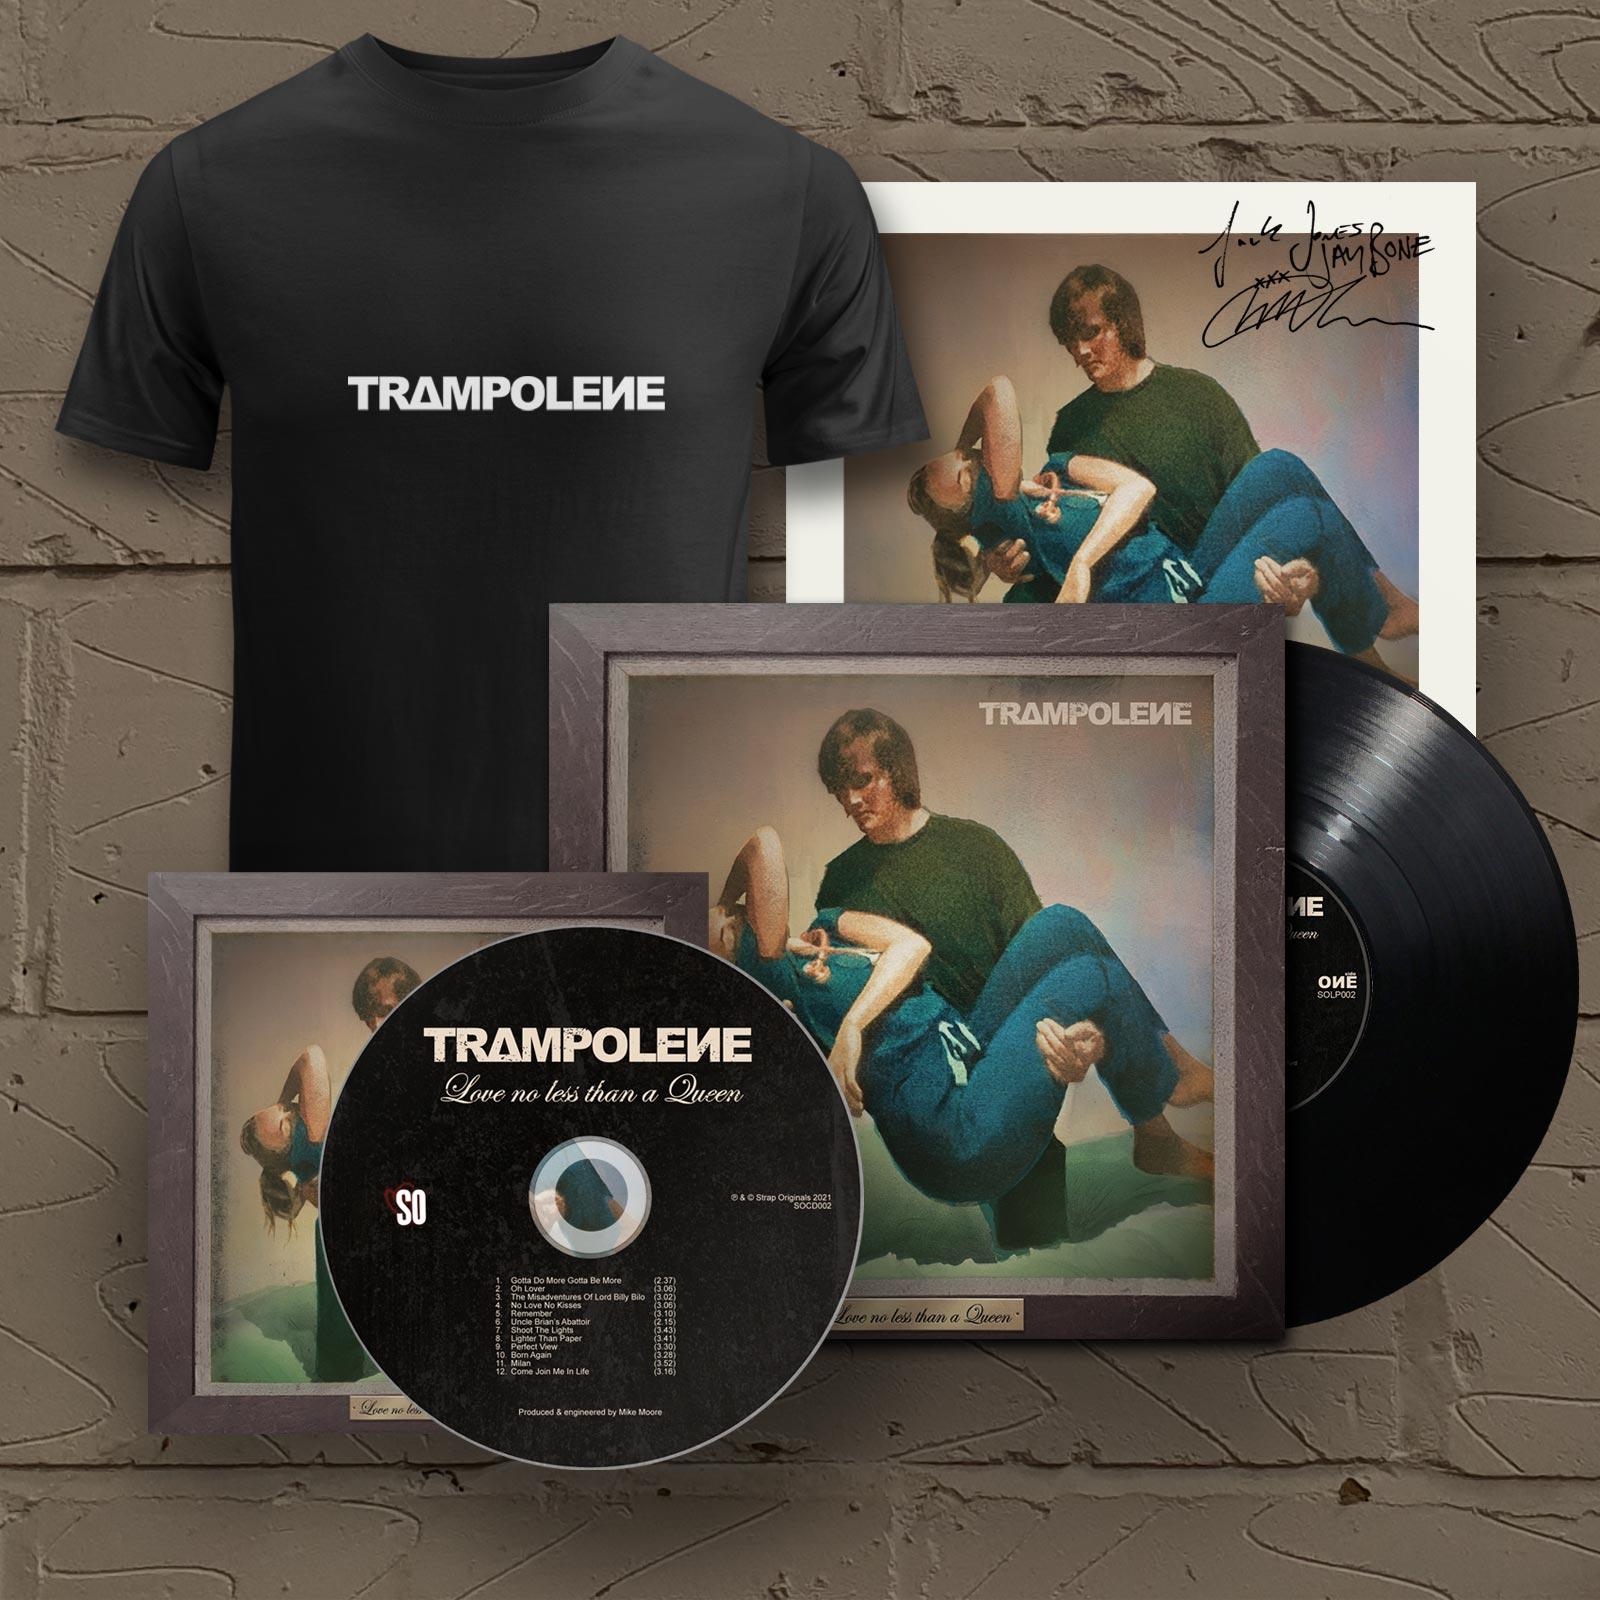 "Black LP & Signed CD & T-Shirt (Includes Signed 12"" Print)"